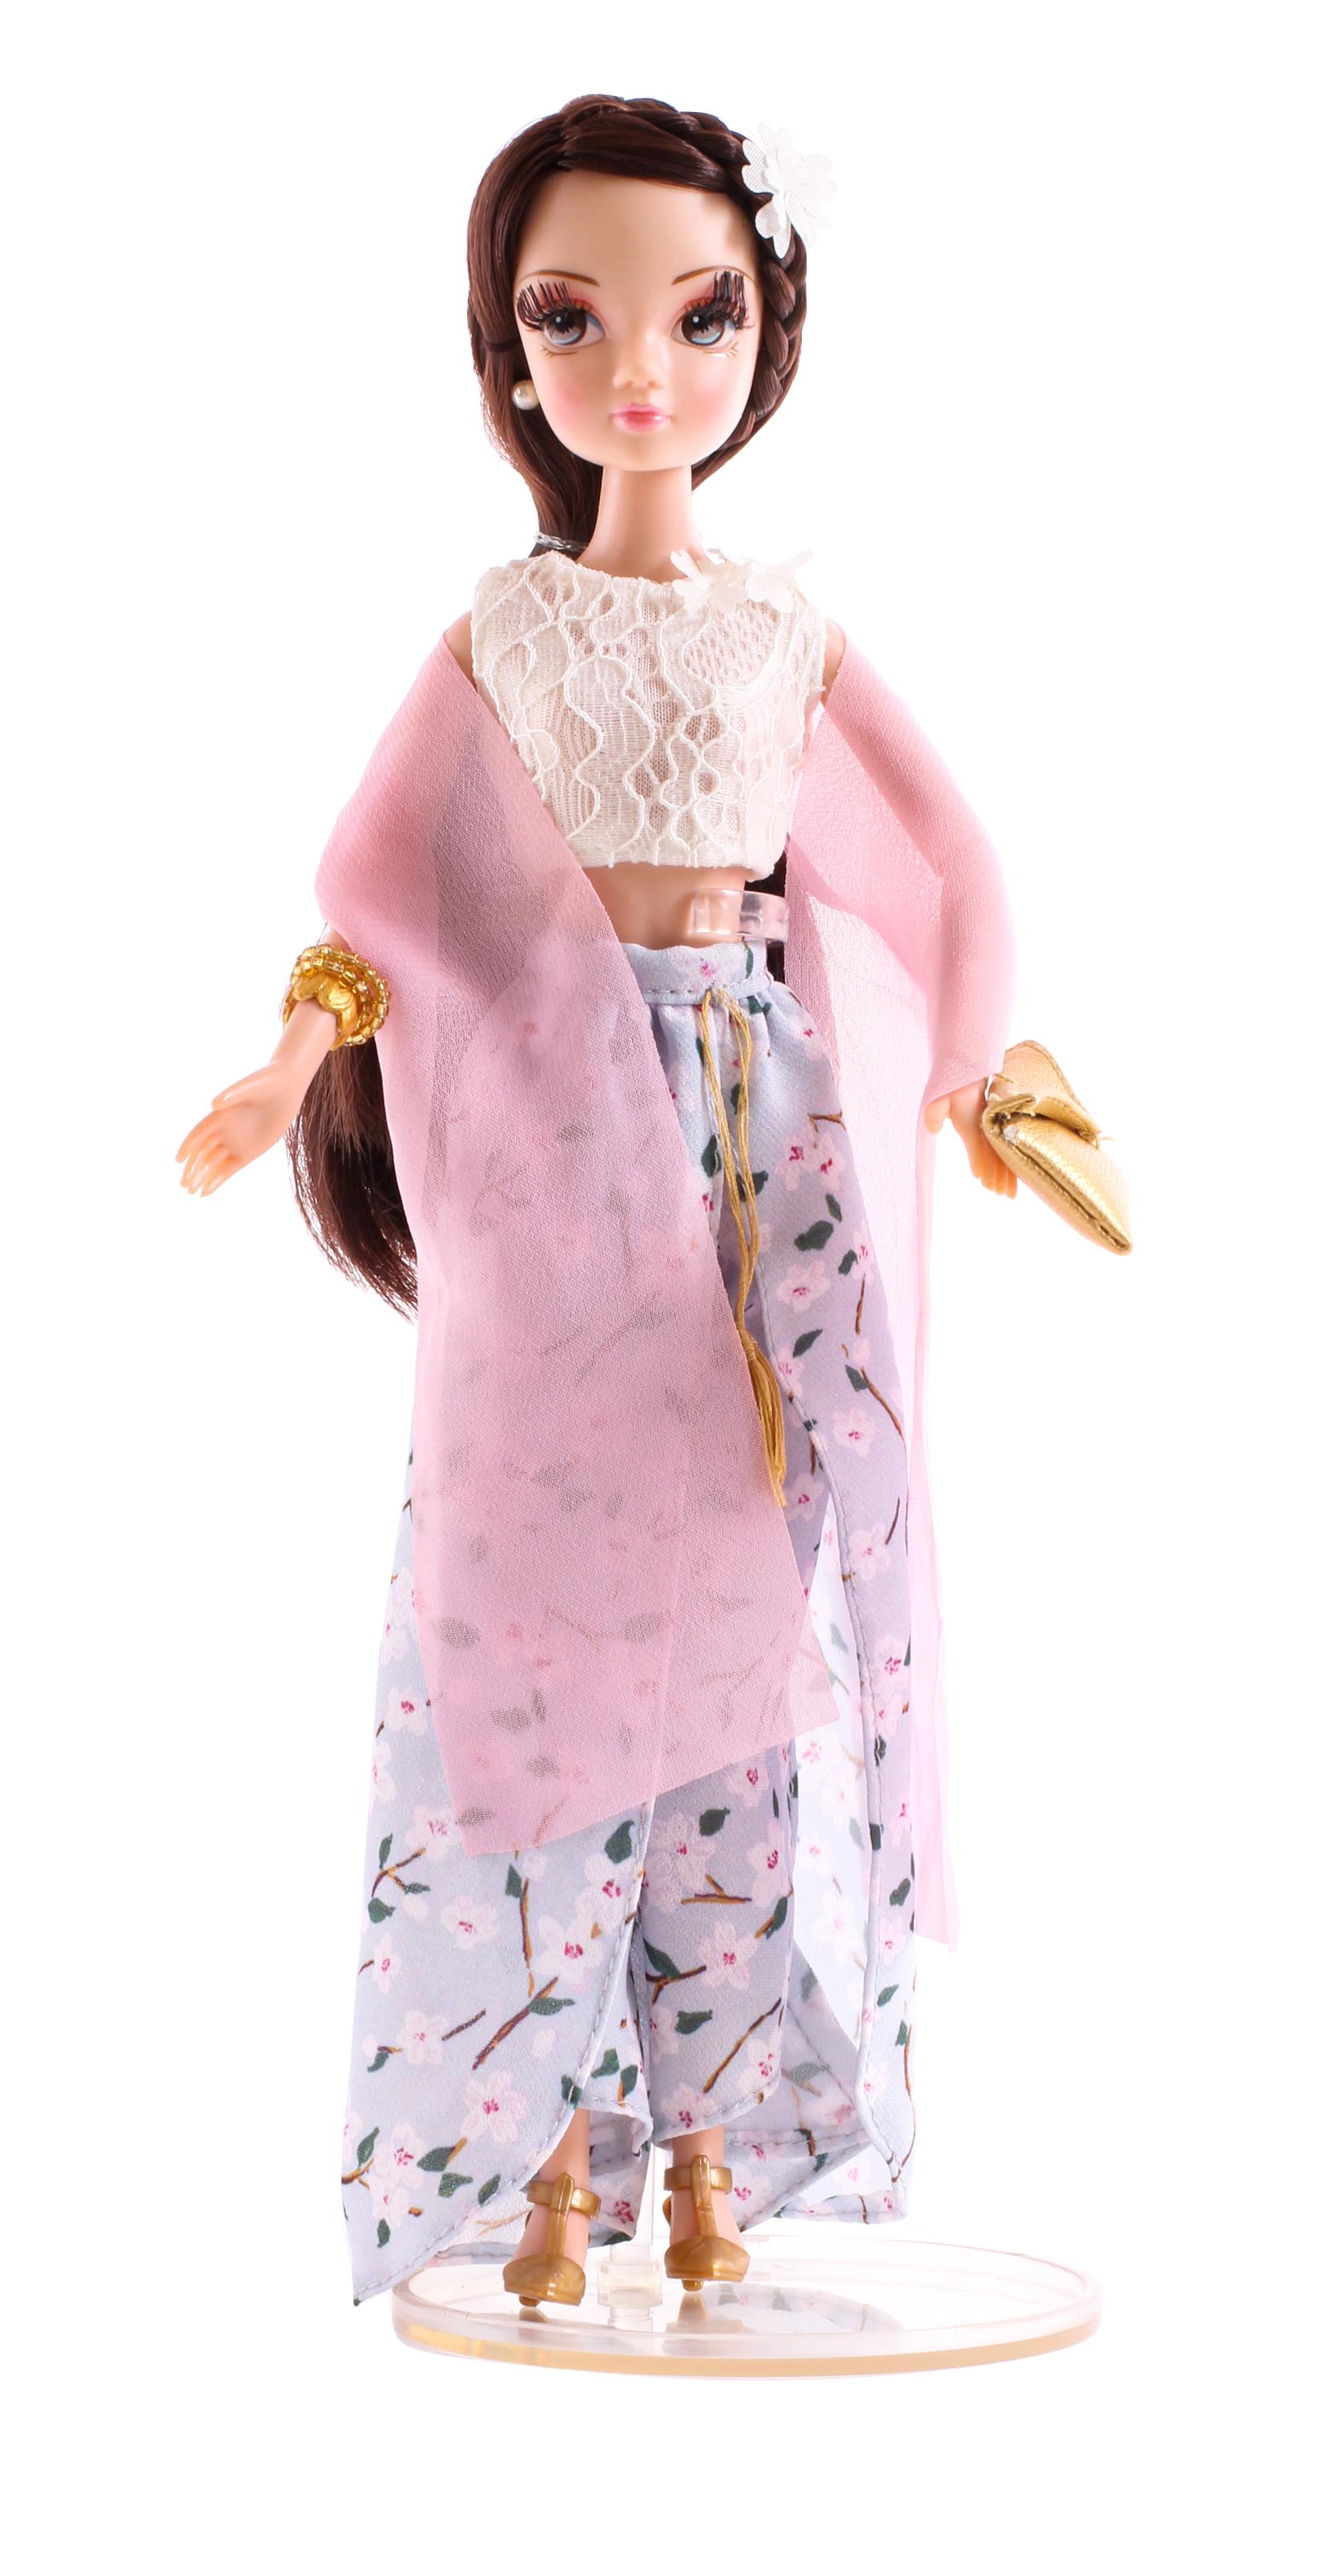 Кукла Sonya Rose Daily collection Свидание